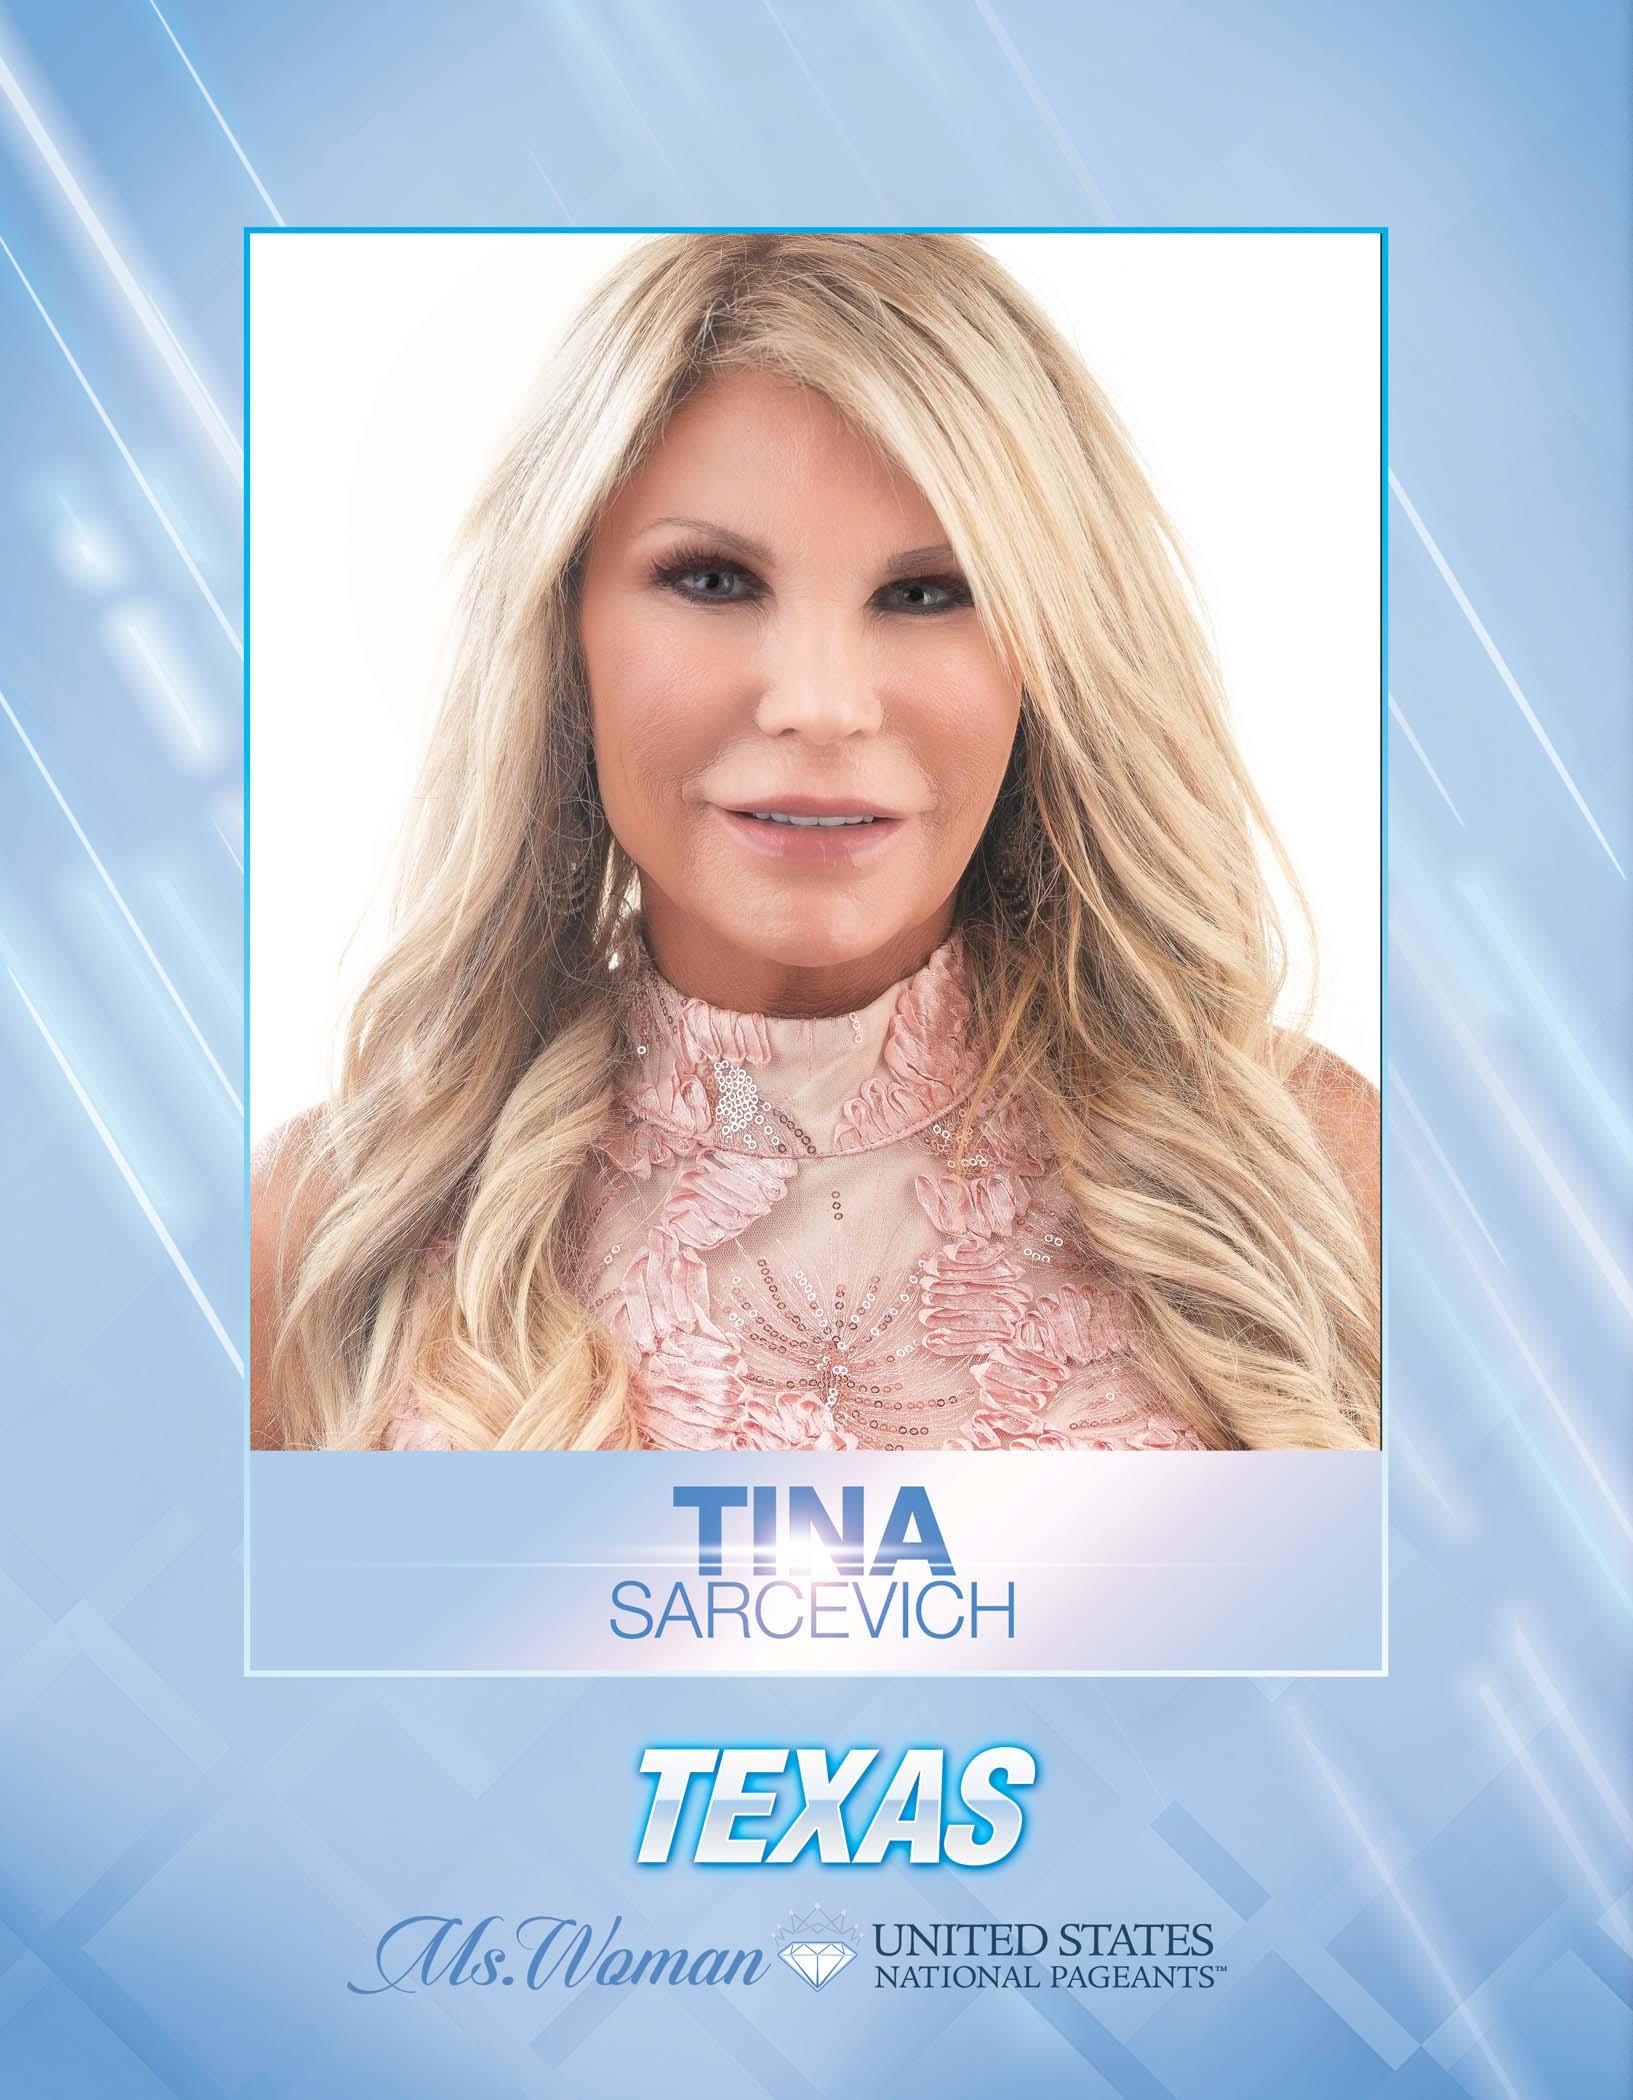 Tina Sarcevich Ms. Woman Texas United States - 2021